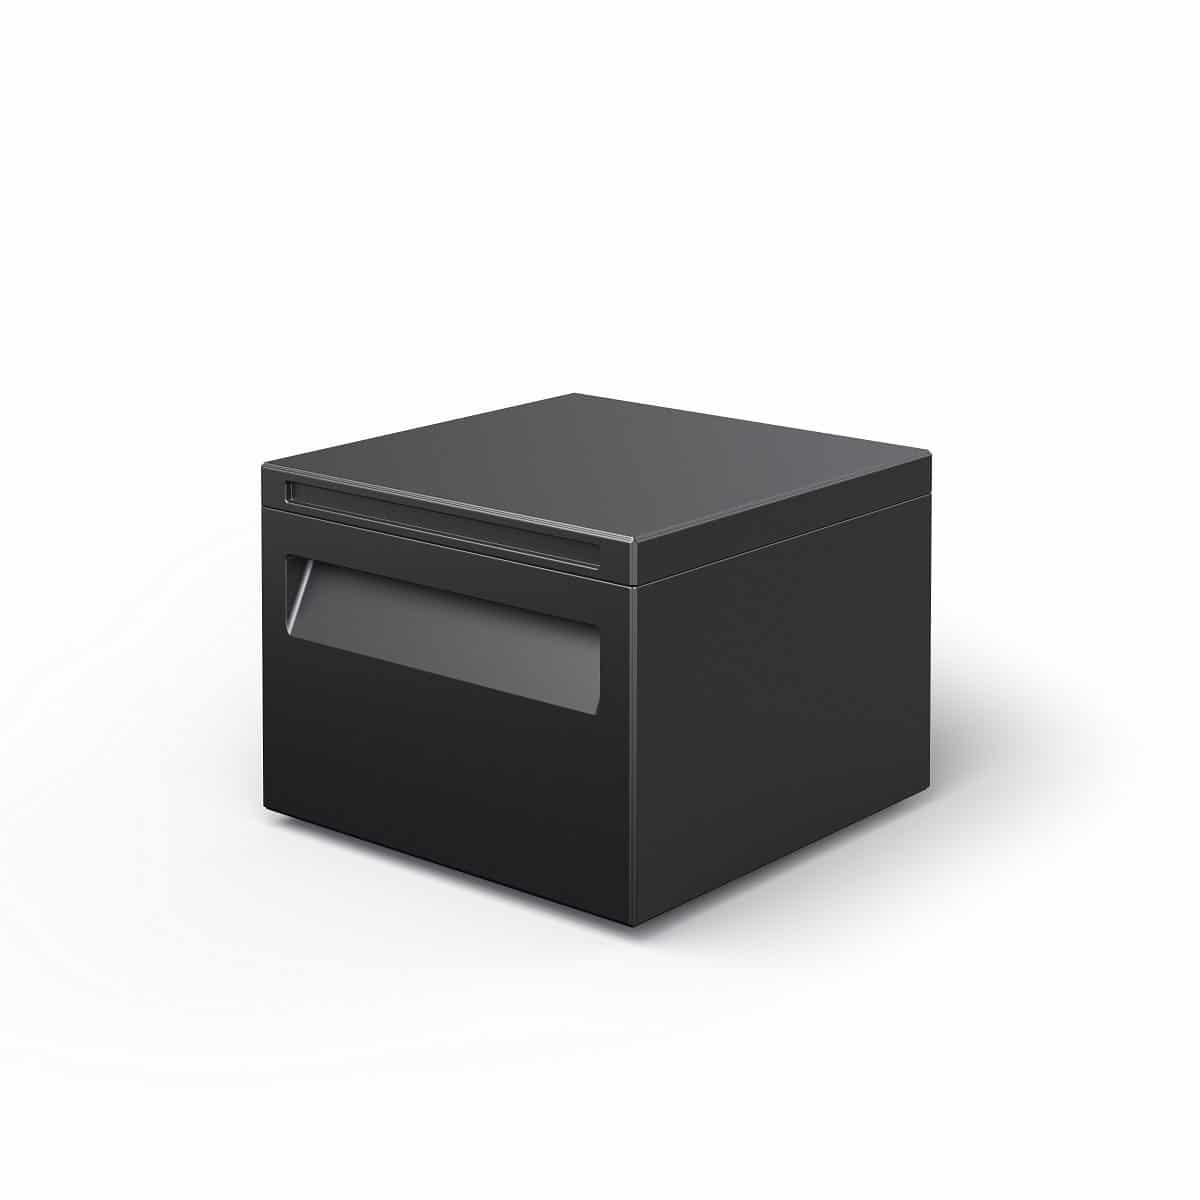 The ANAORI Kakugama is a cube shaped masterpiece